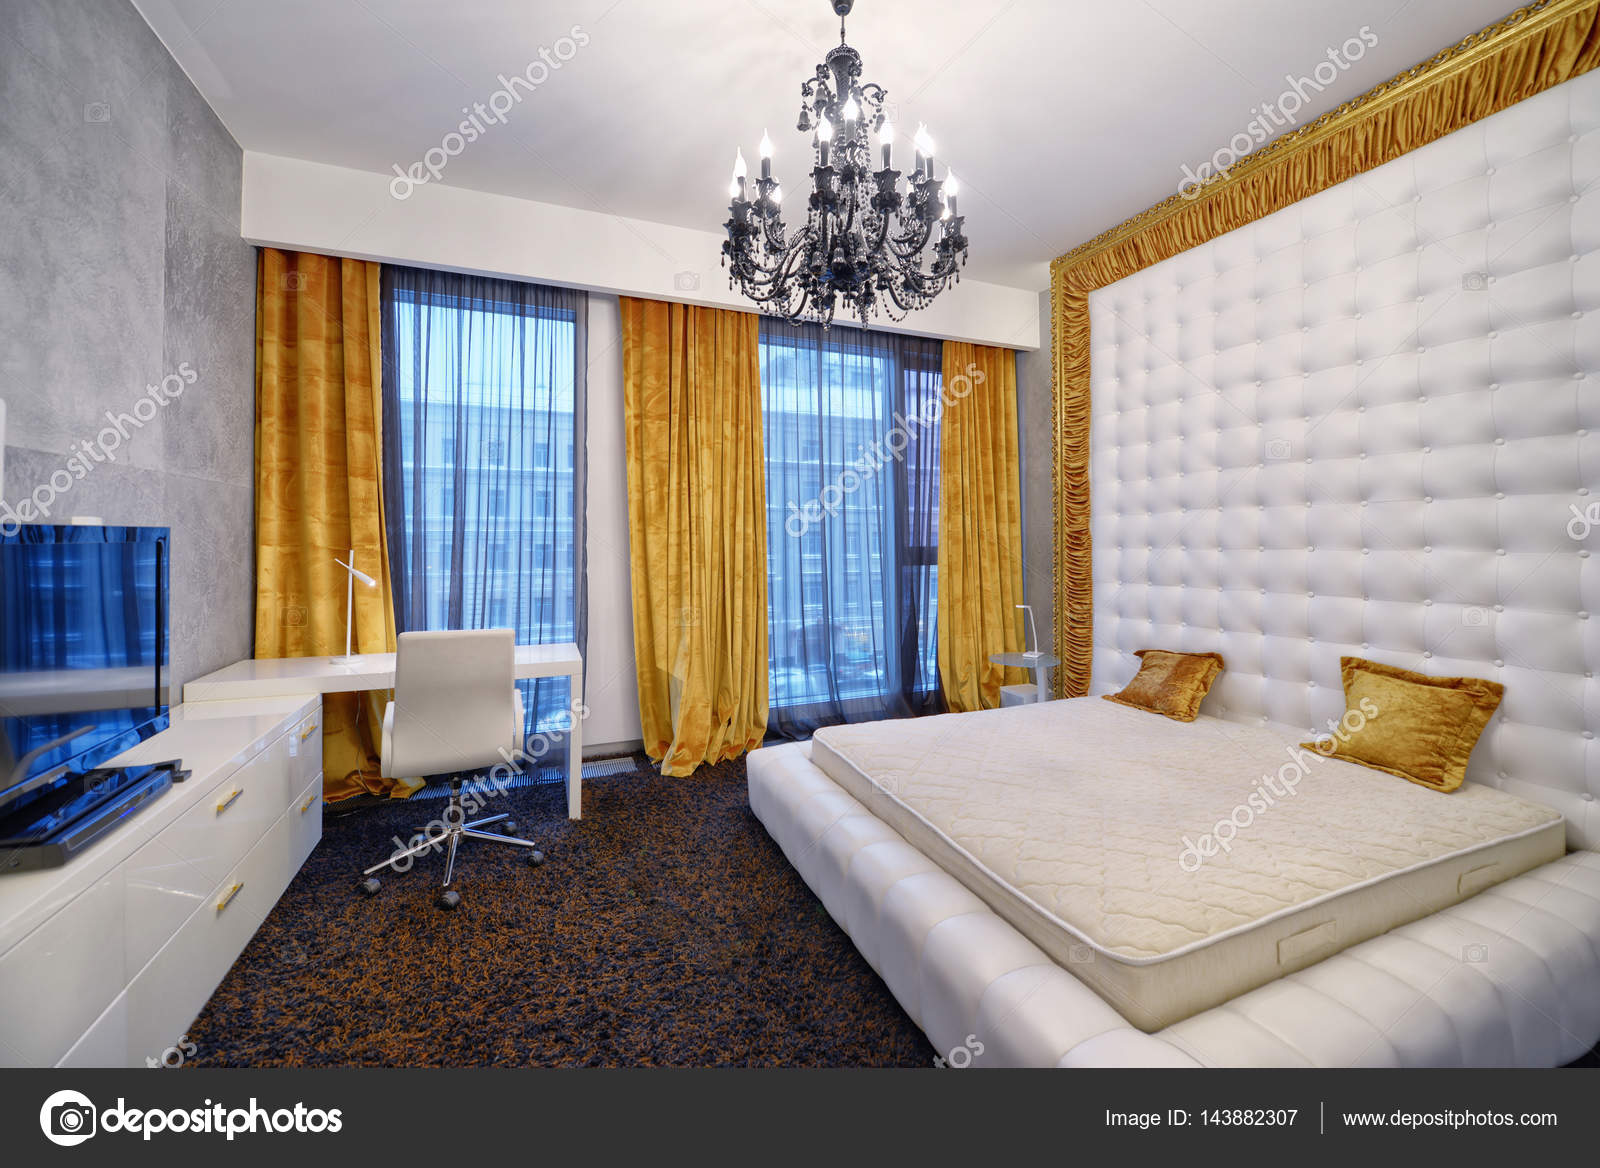 Modern interieur slaapkamer stad onroerend goed — Stockfoto ...